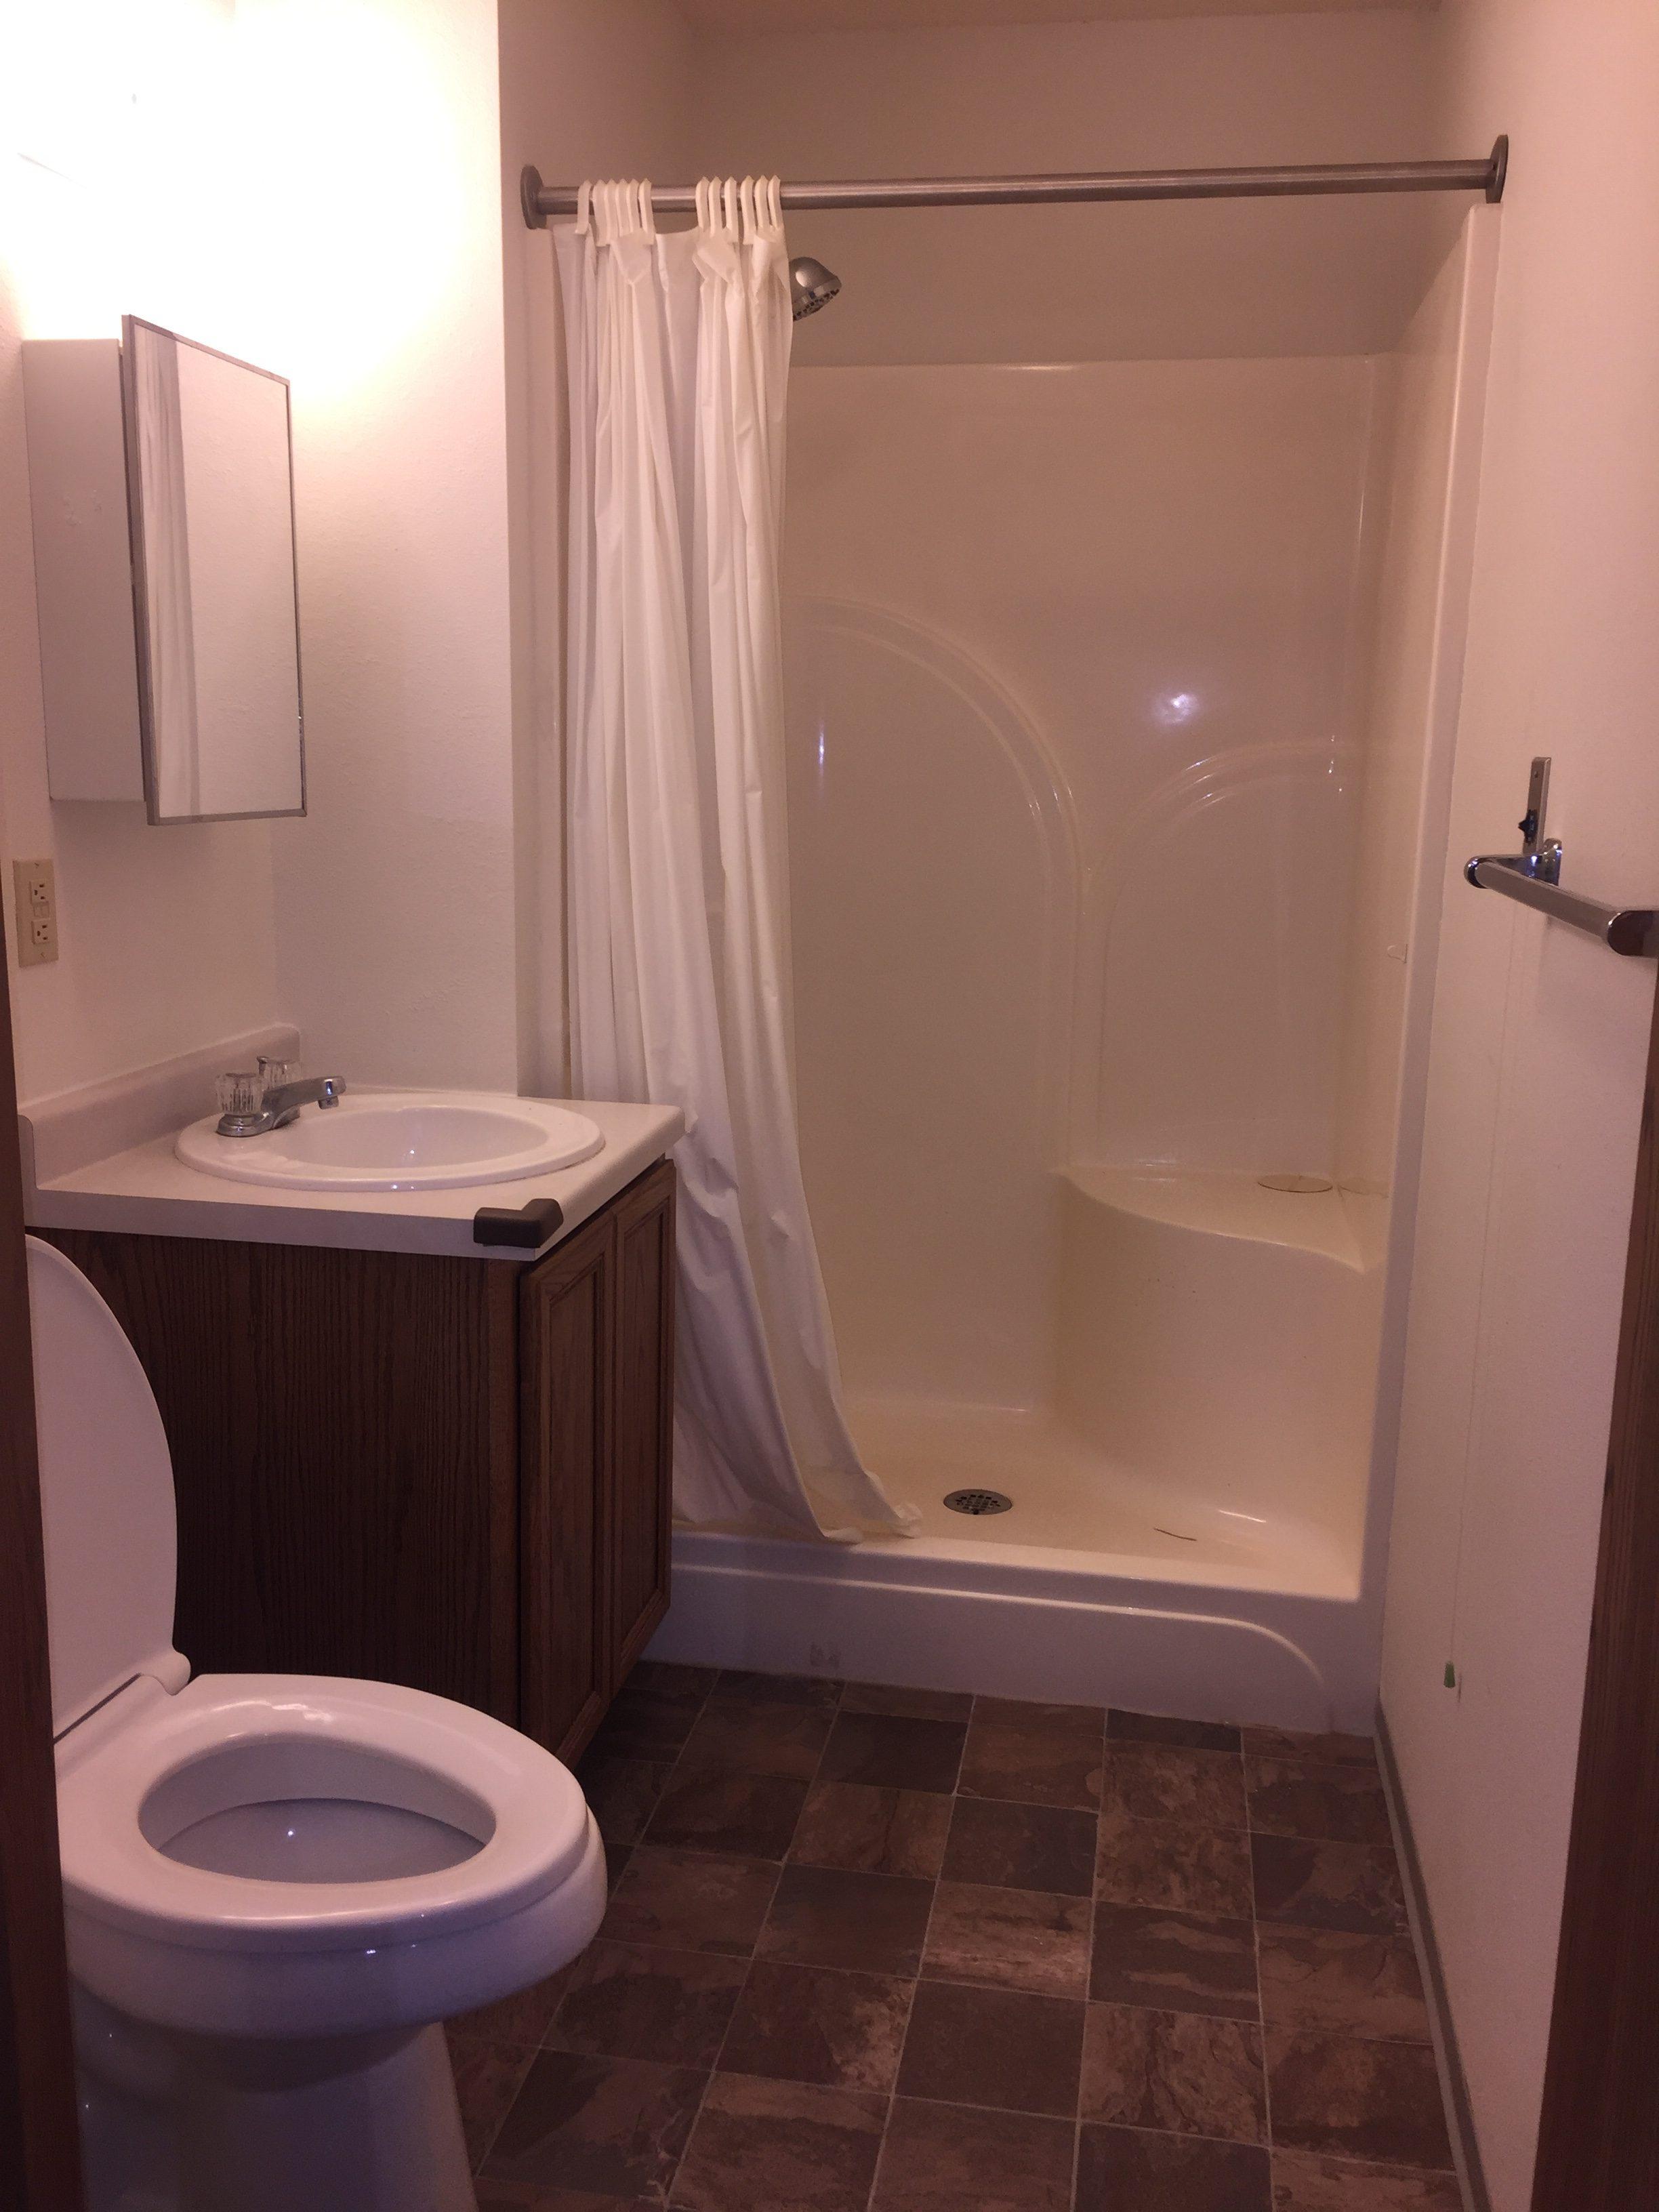 Bathroom - Valmeyer Senior Apartments